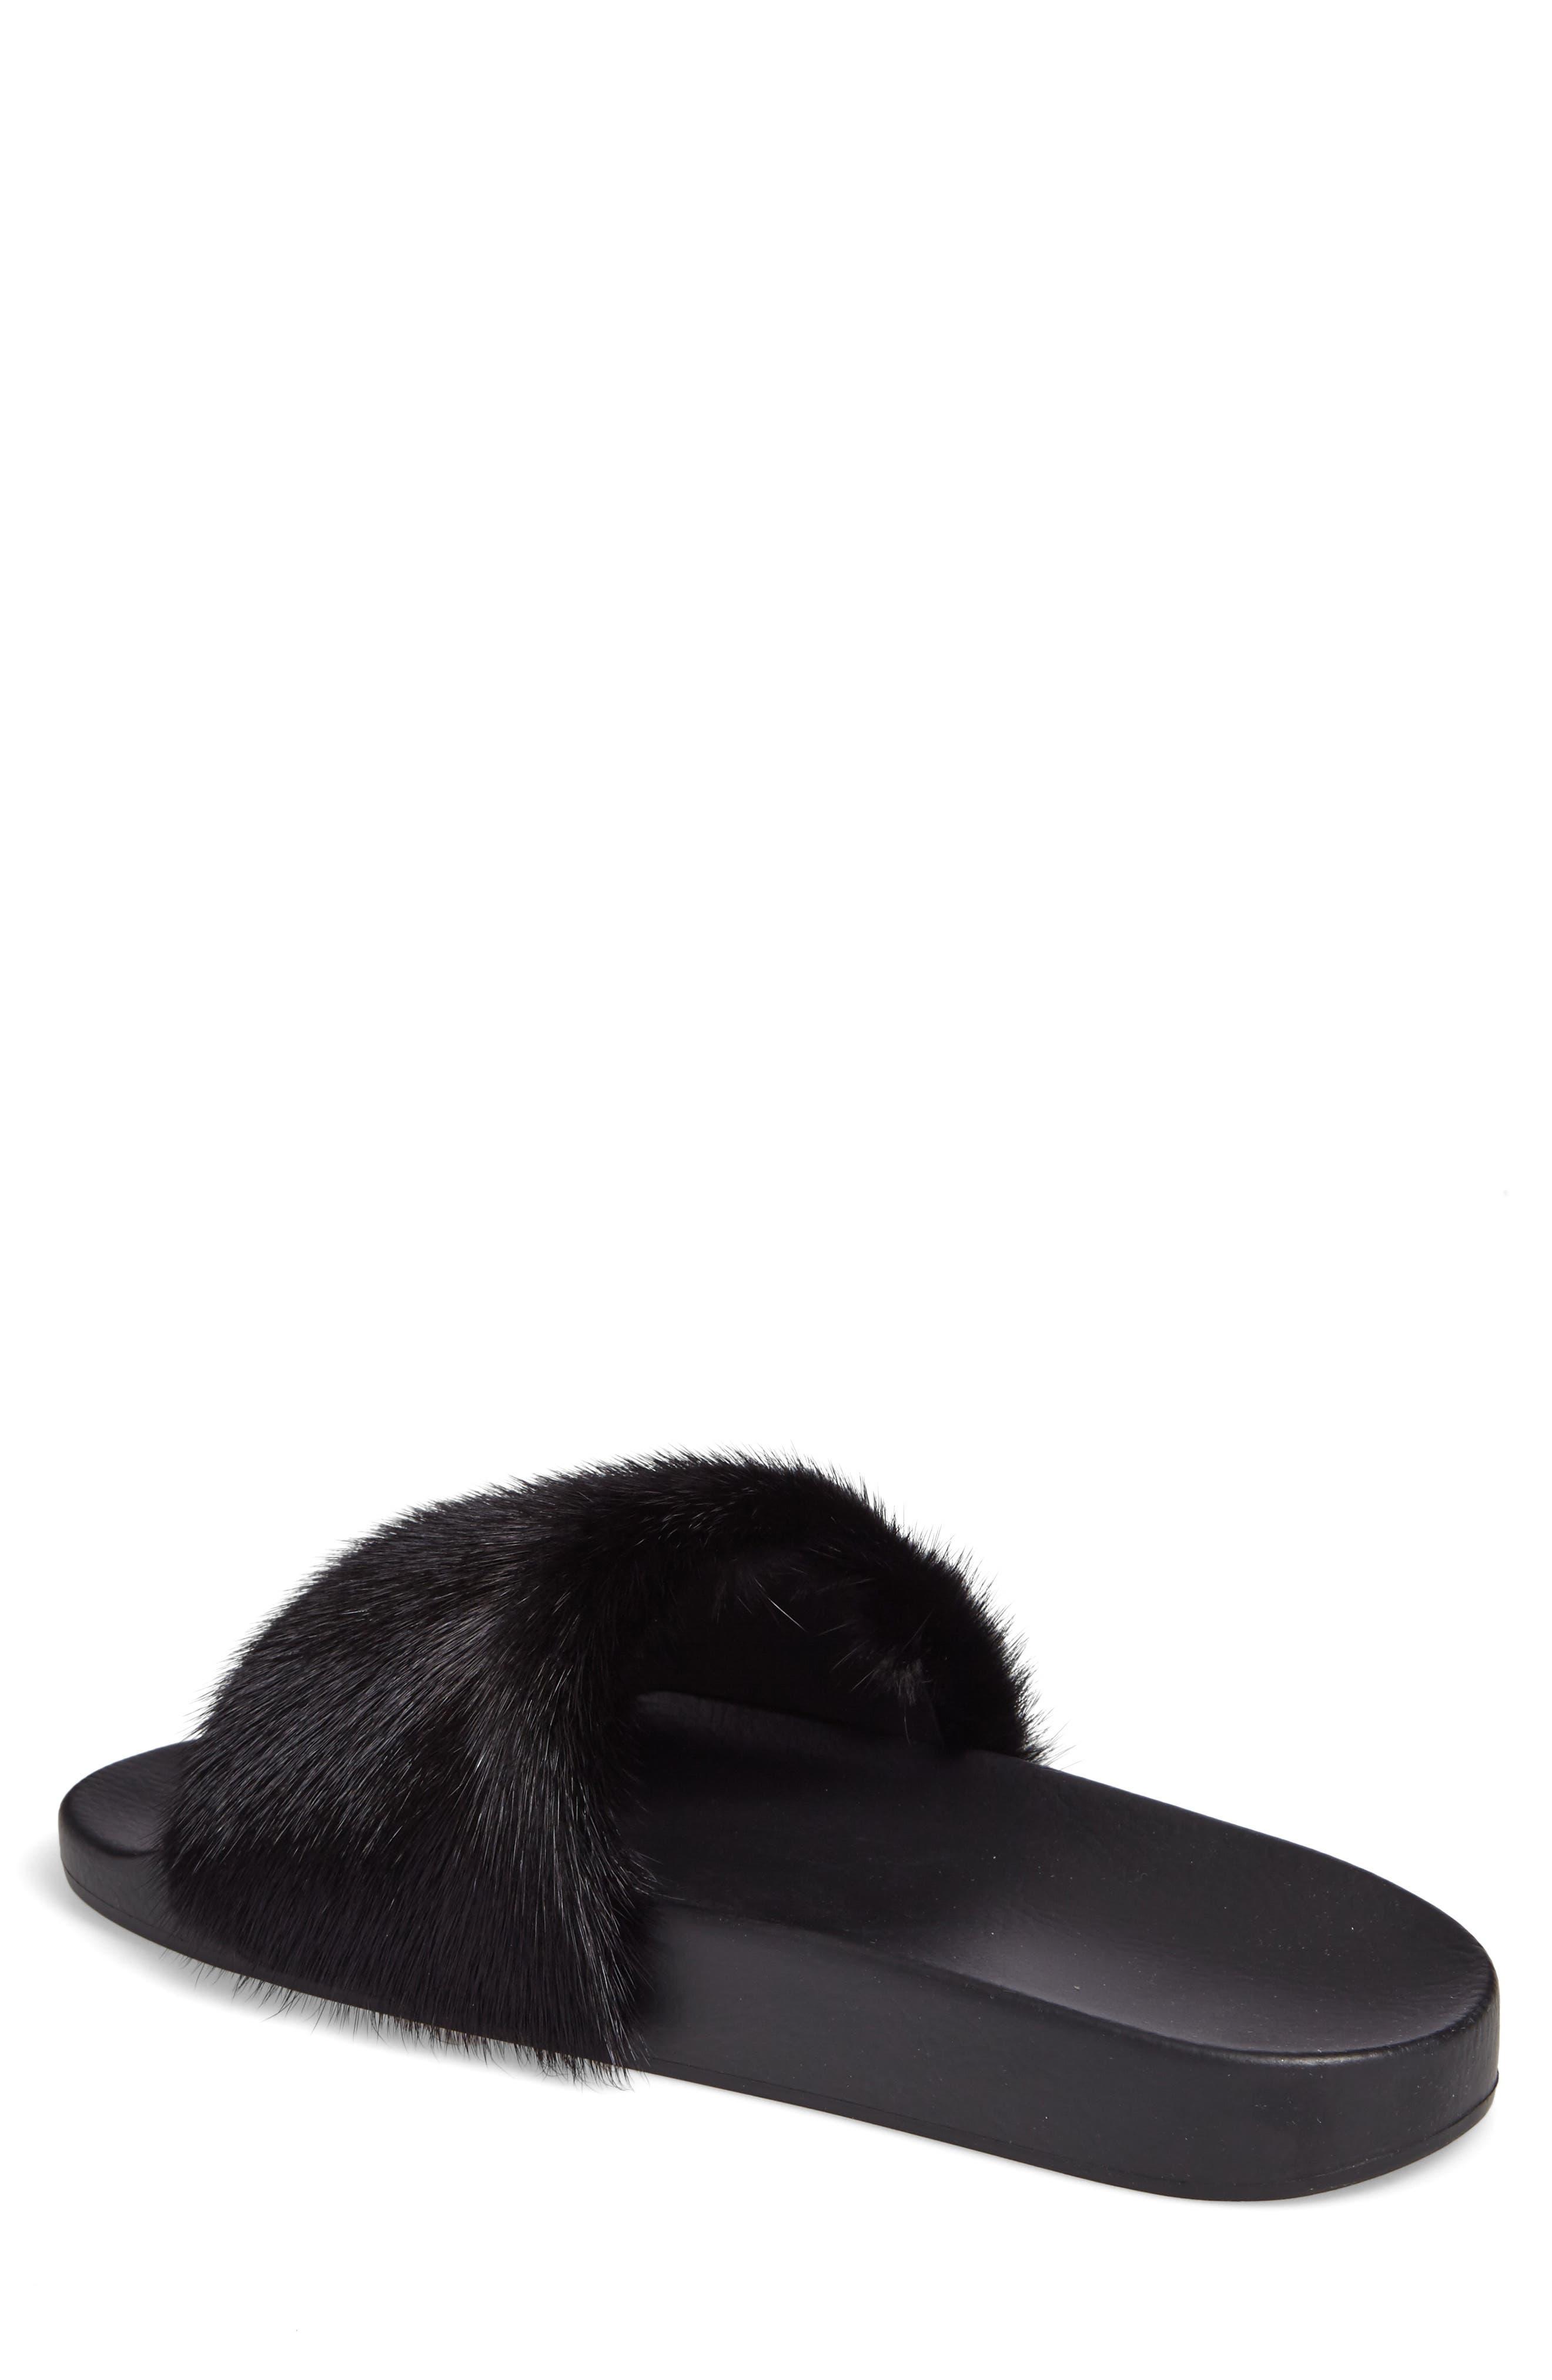 Genuine Mink Fur Slide Sandal,                             Alternate thumbnail 2, color,                             001